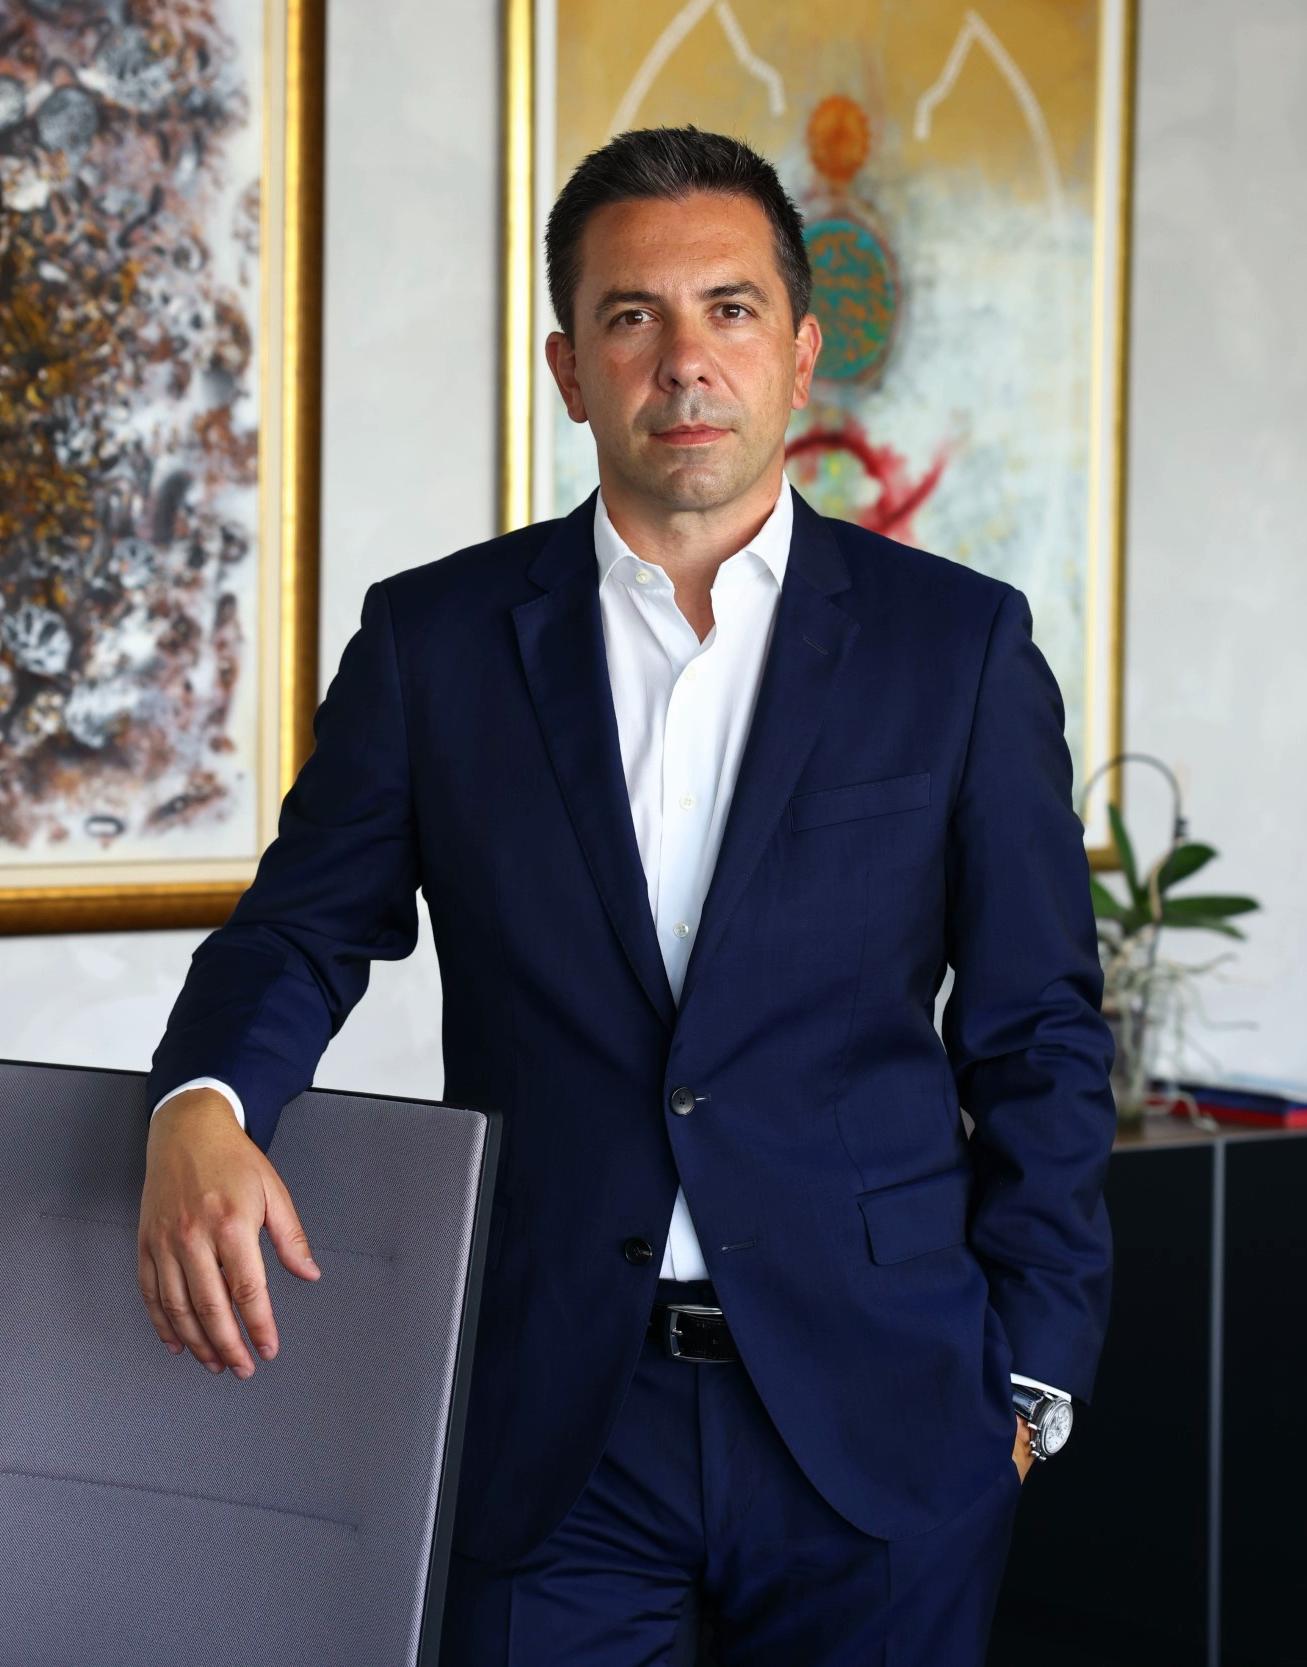 Sanel Kusturica Member of Management Board